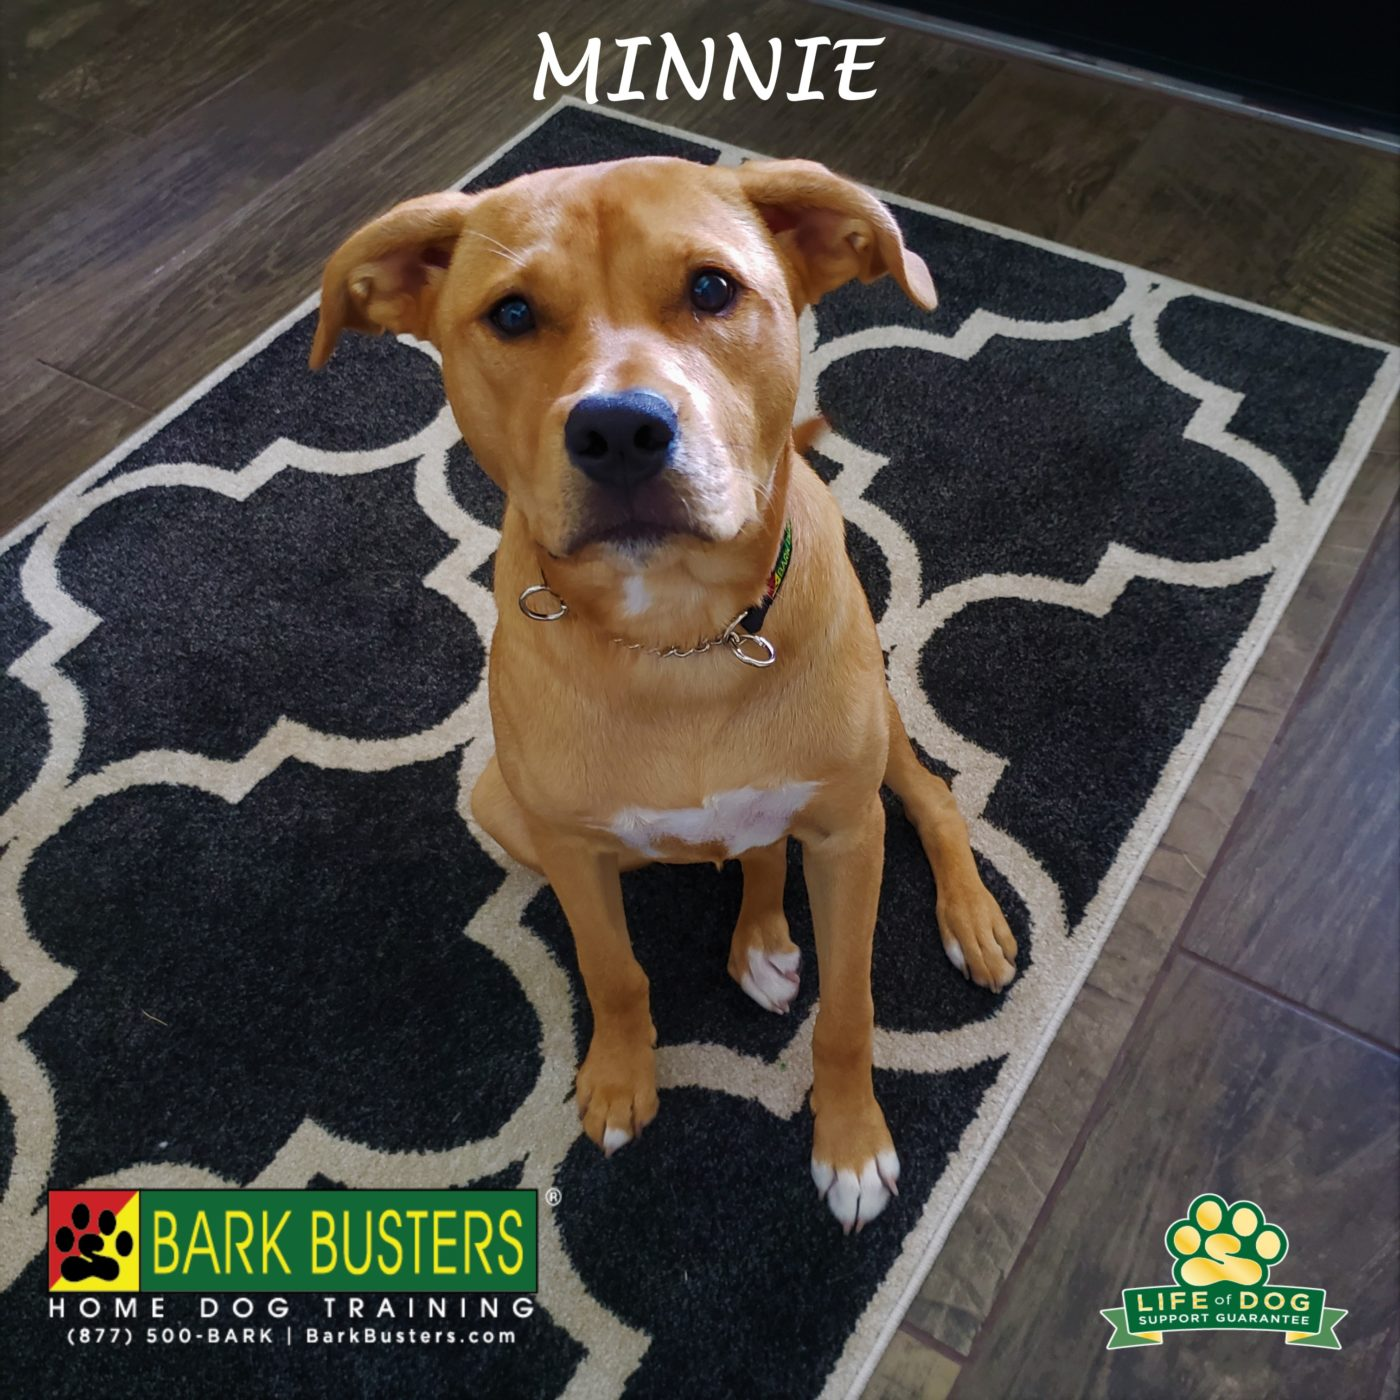 #pitbullmix #leashtraining #obediencetraining #doormanners #dogtrainingroundrock #dogtrainernearme #barkbusters #abetterwaytoabetterdog #inhomedogtraining